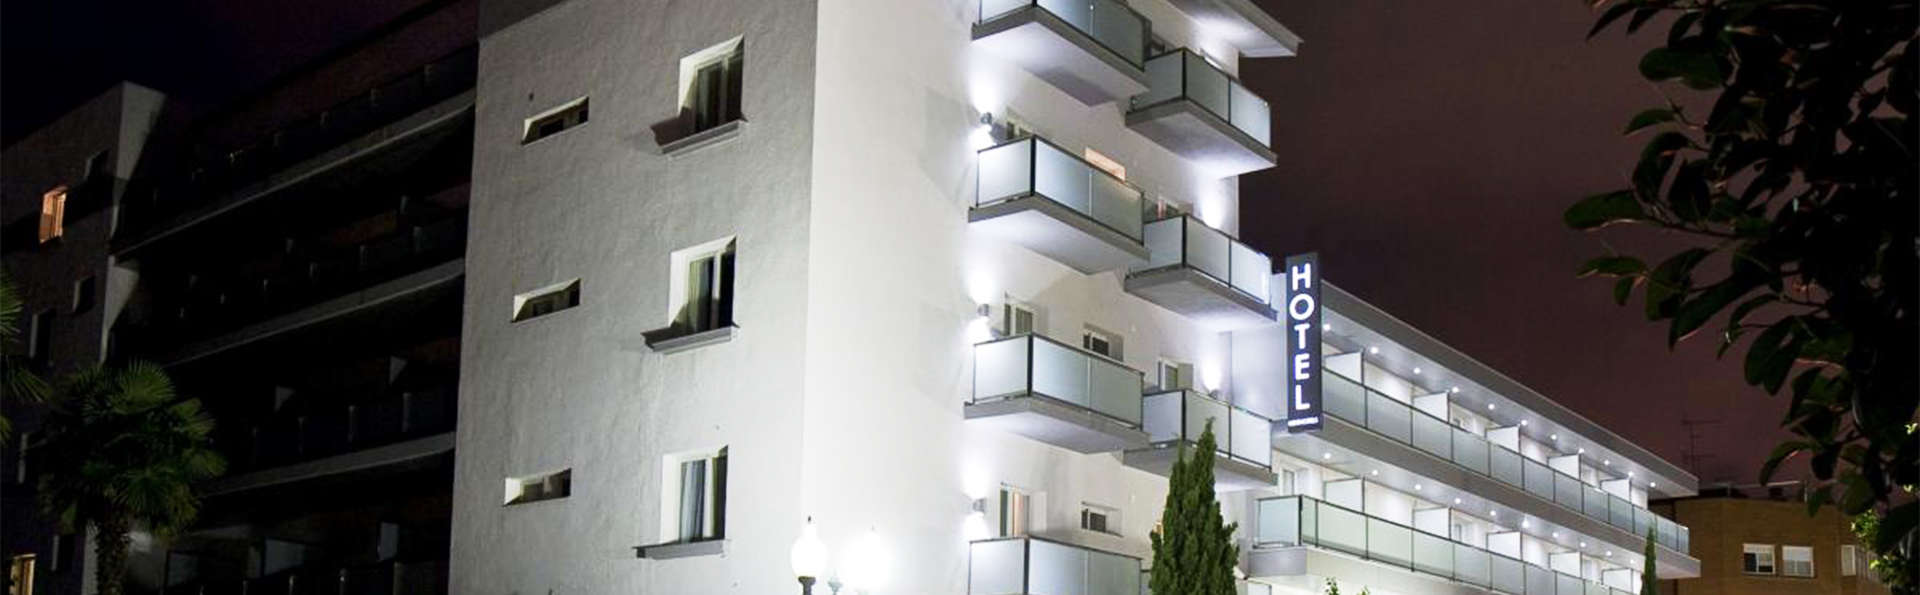 Hotel Astari - EDIT_front1.jpg